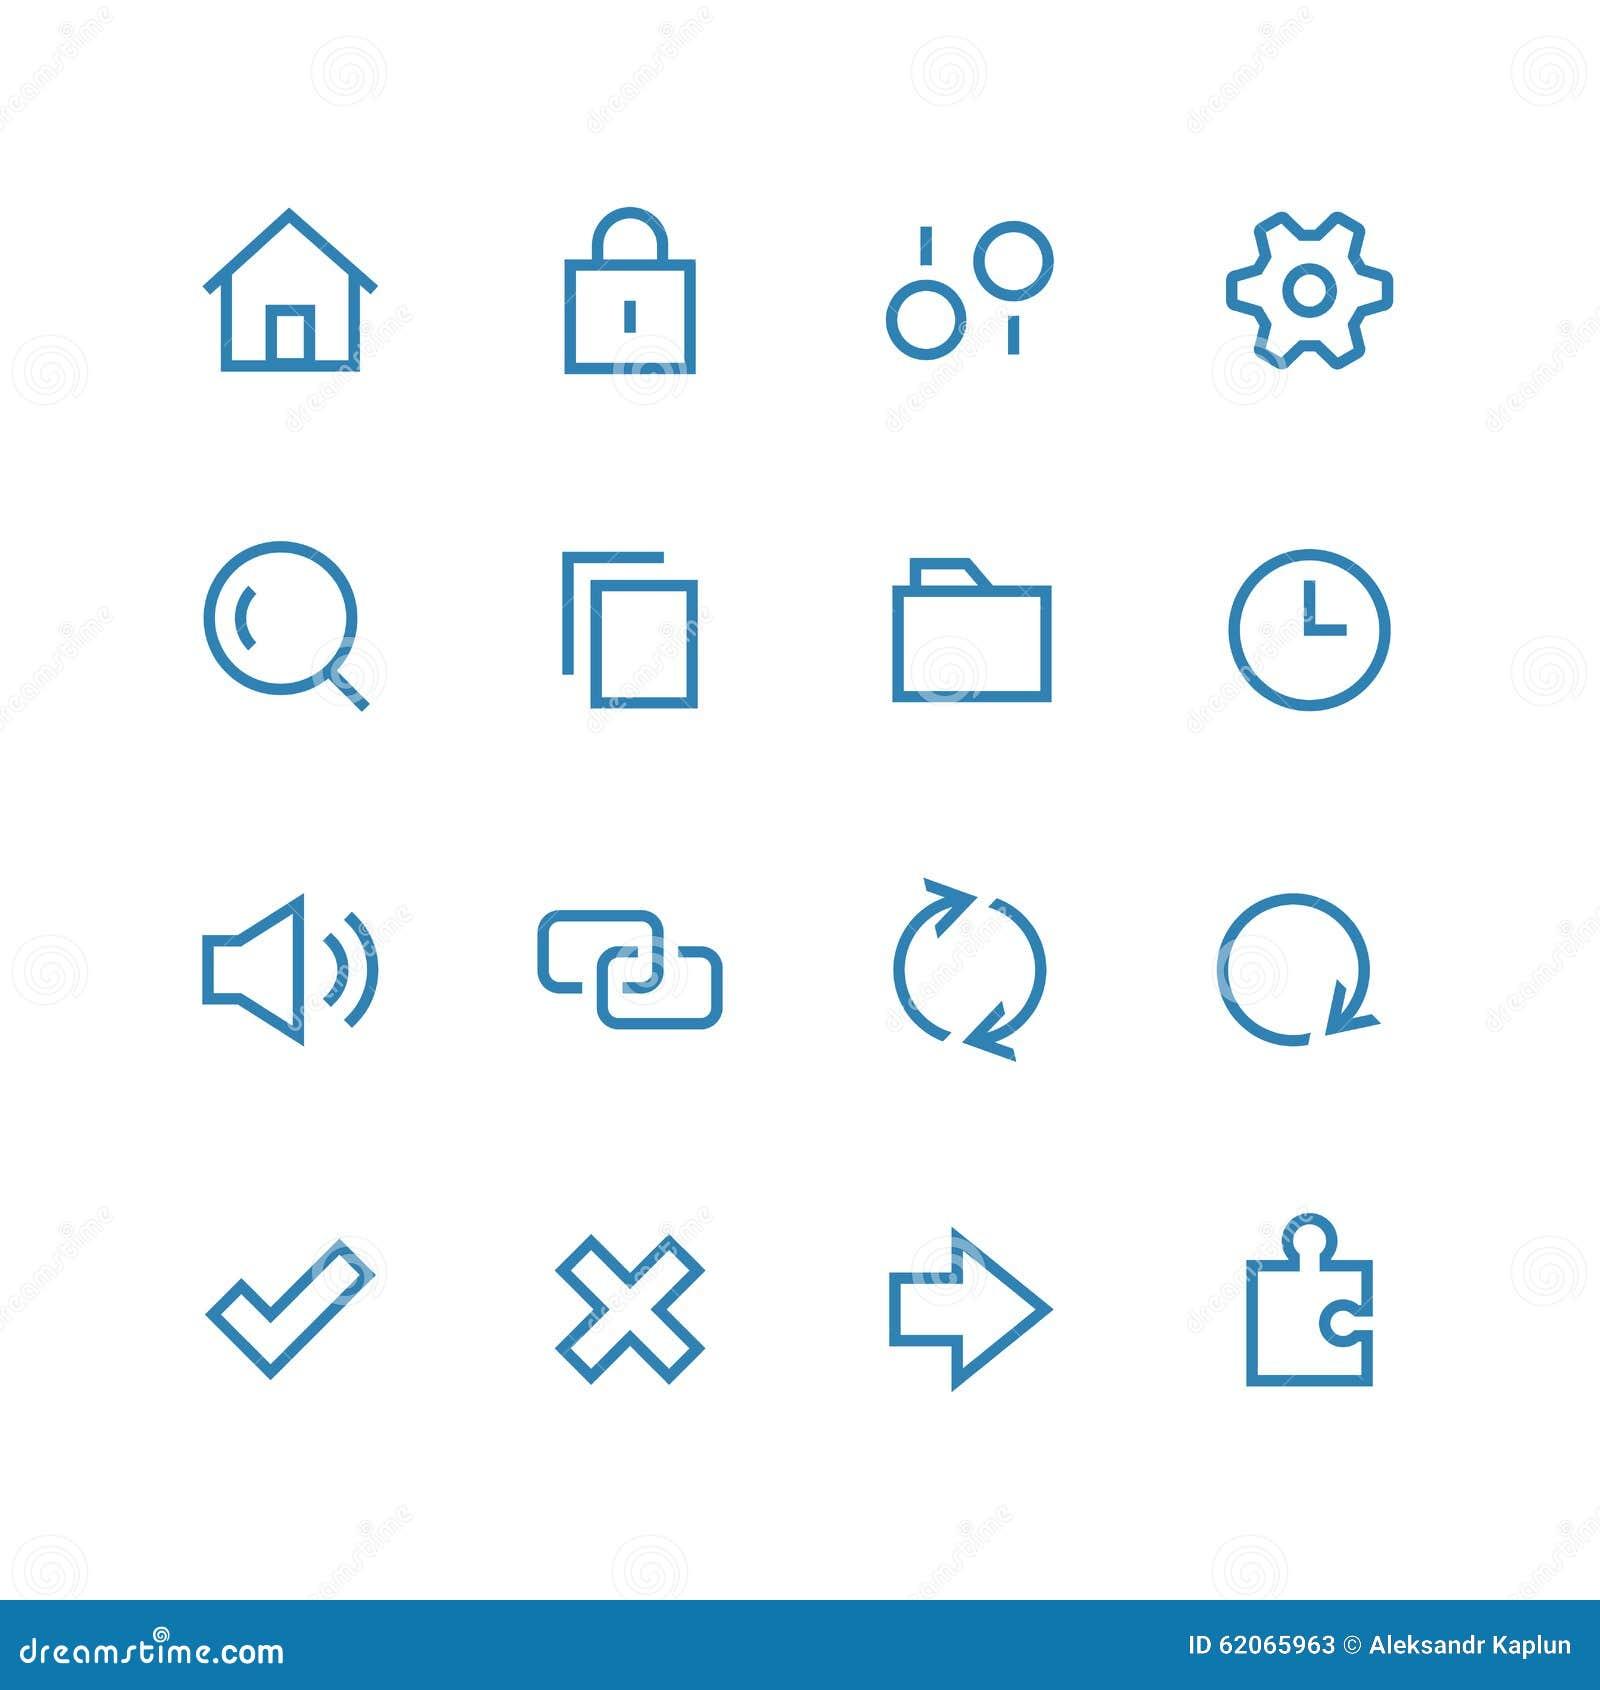 Set planets solar system cartoon style flat icon stock vector image - System Icon Set Stock Vector Image 62065963